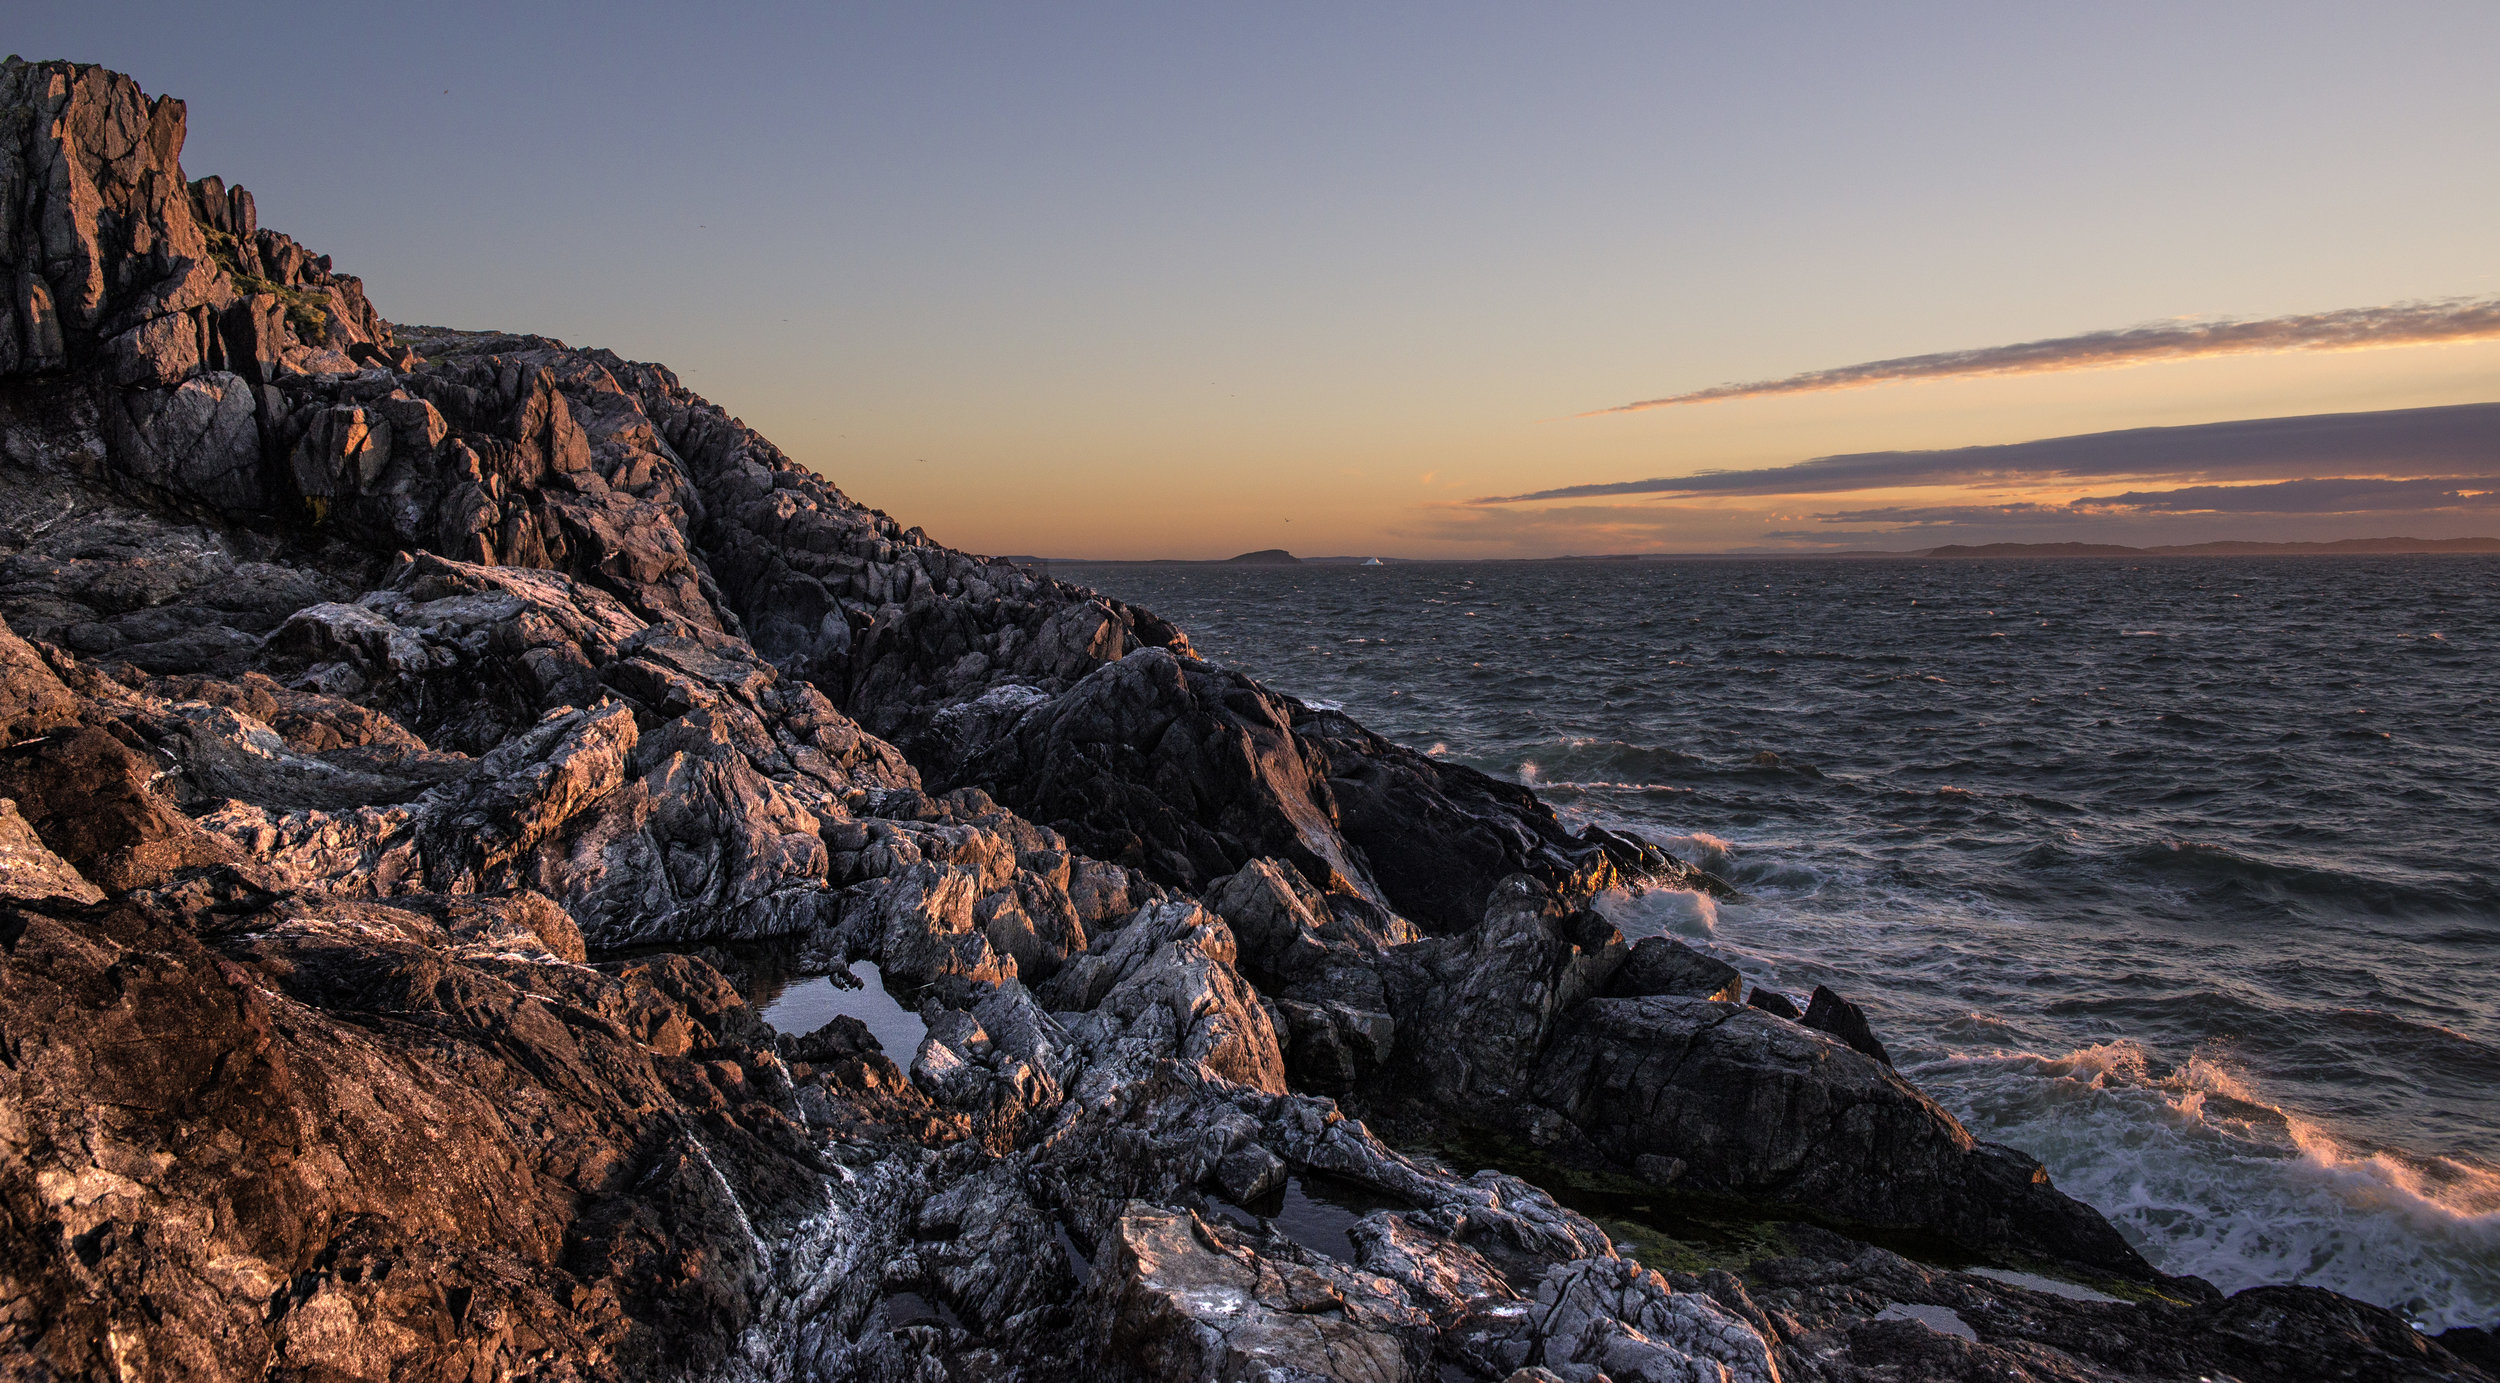 Quirpon Island Sunset - Chris Pepper